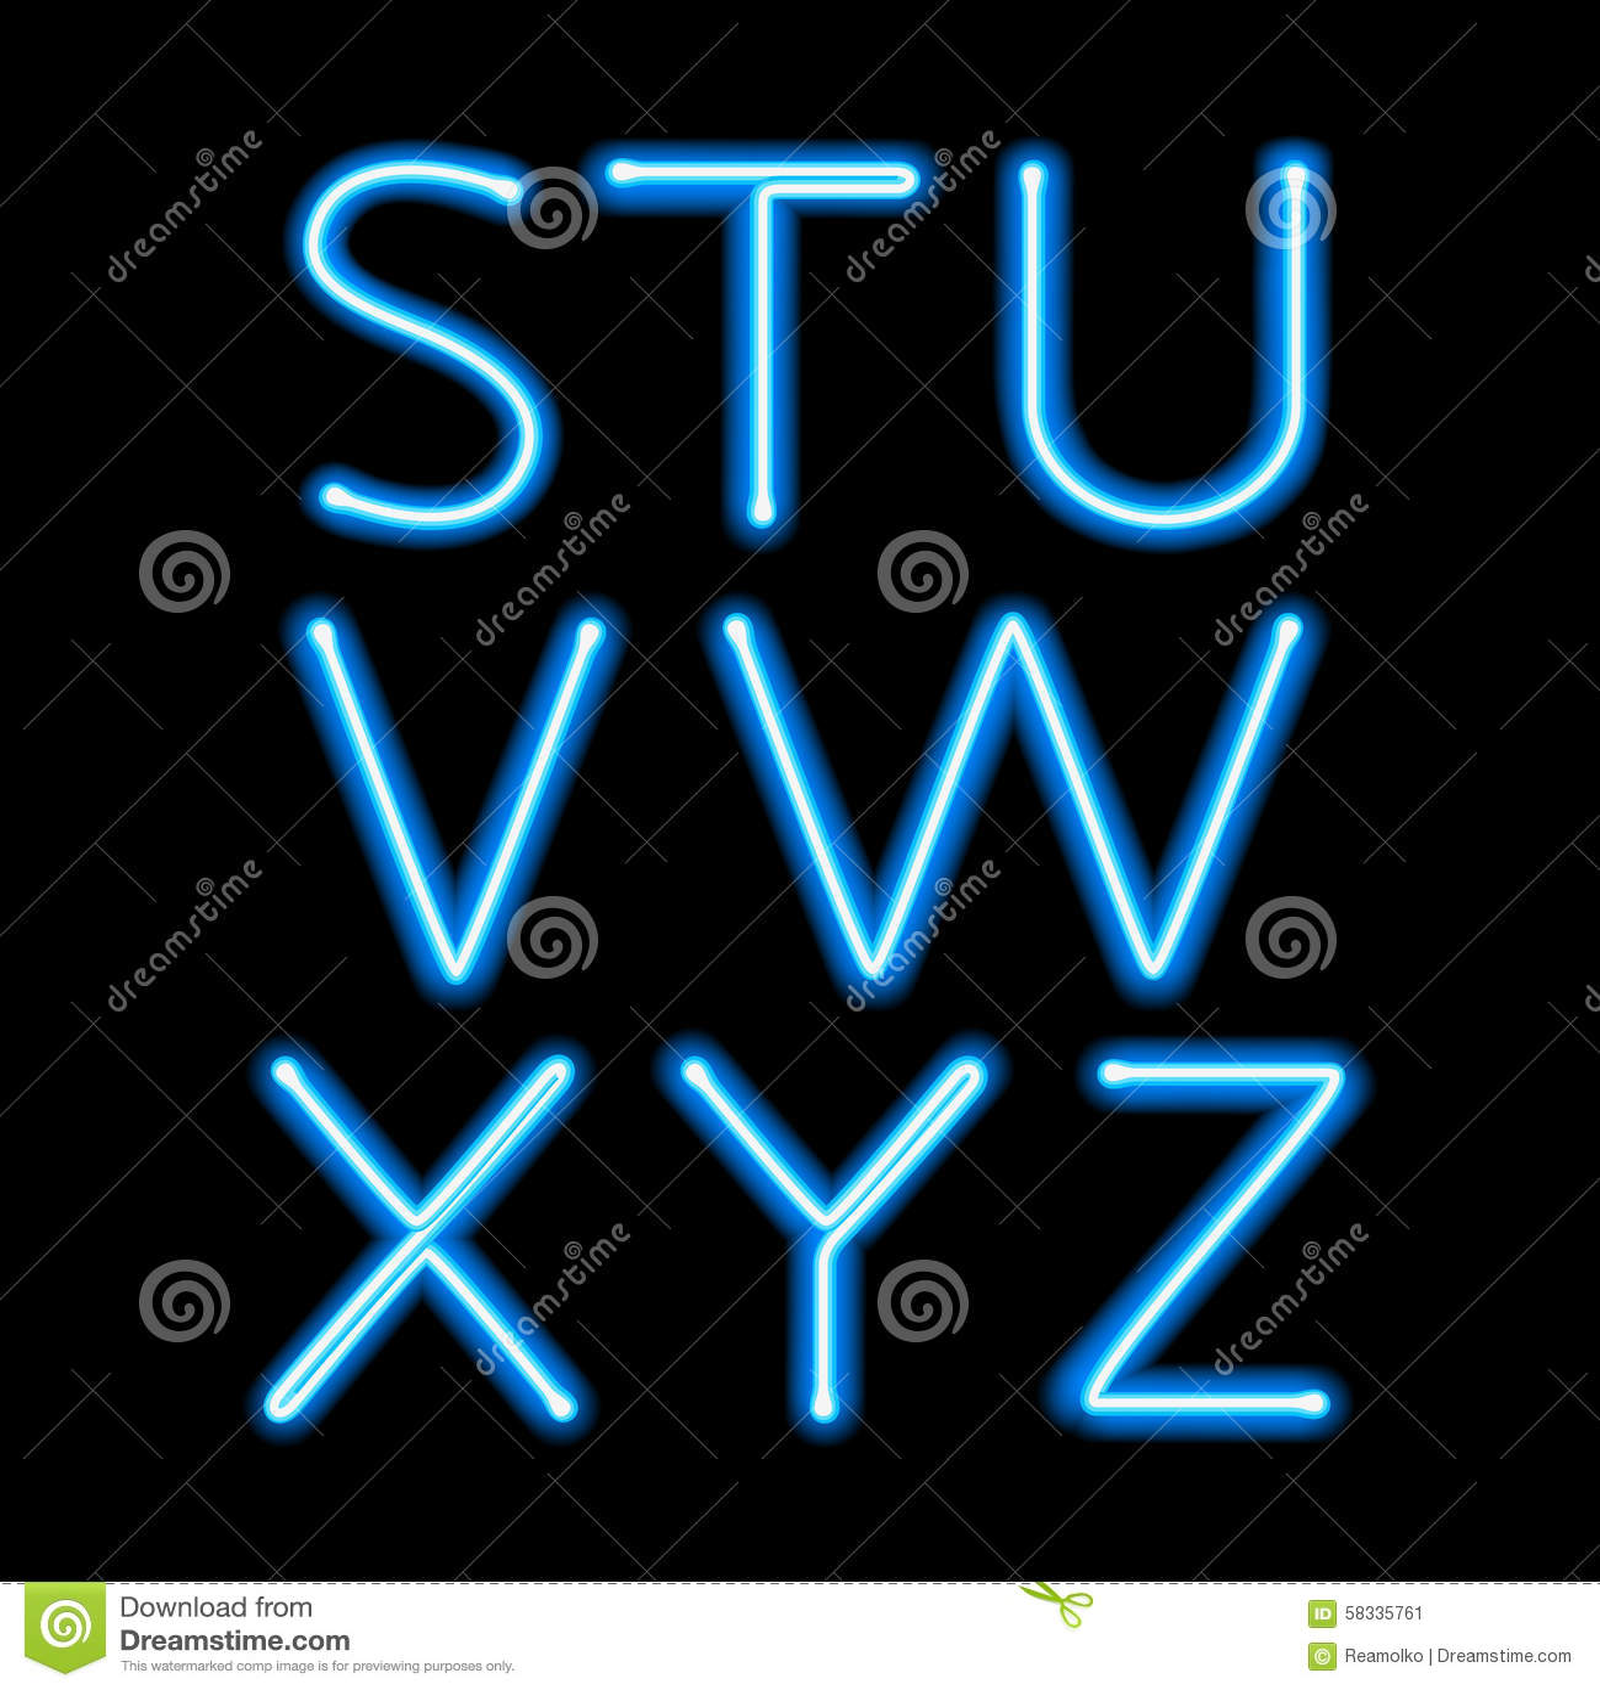 blue neon light glowing letters set stock vector. Black Bedroom Furniture Sets. Home Design Ideas